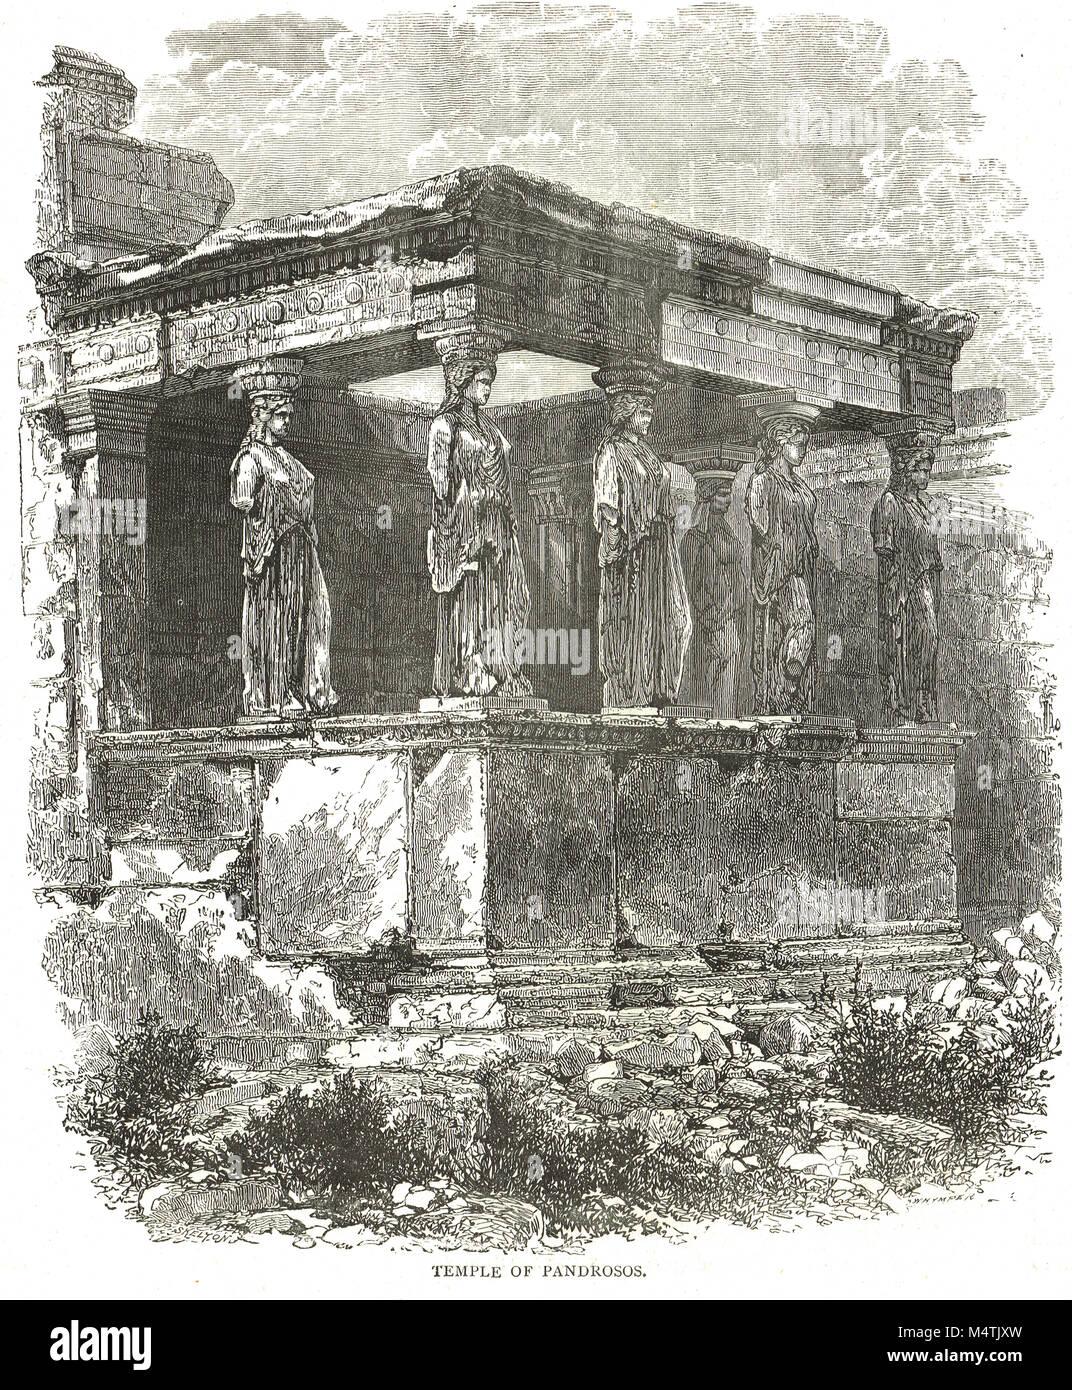 Porch of the Caryatids, Erechtheion, Sanctuary of Pandrosos, Acropolis, Athens, Greece - Stock Image